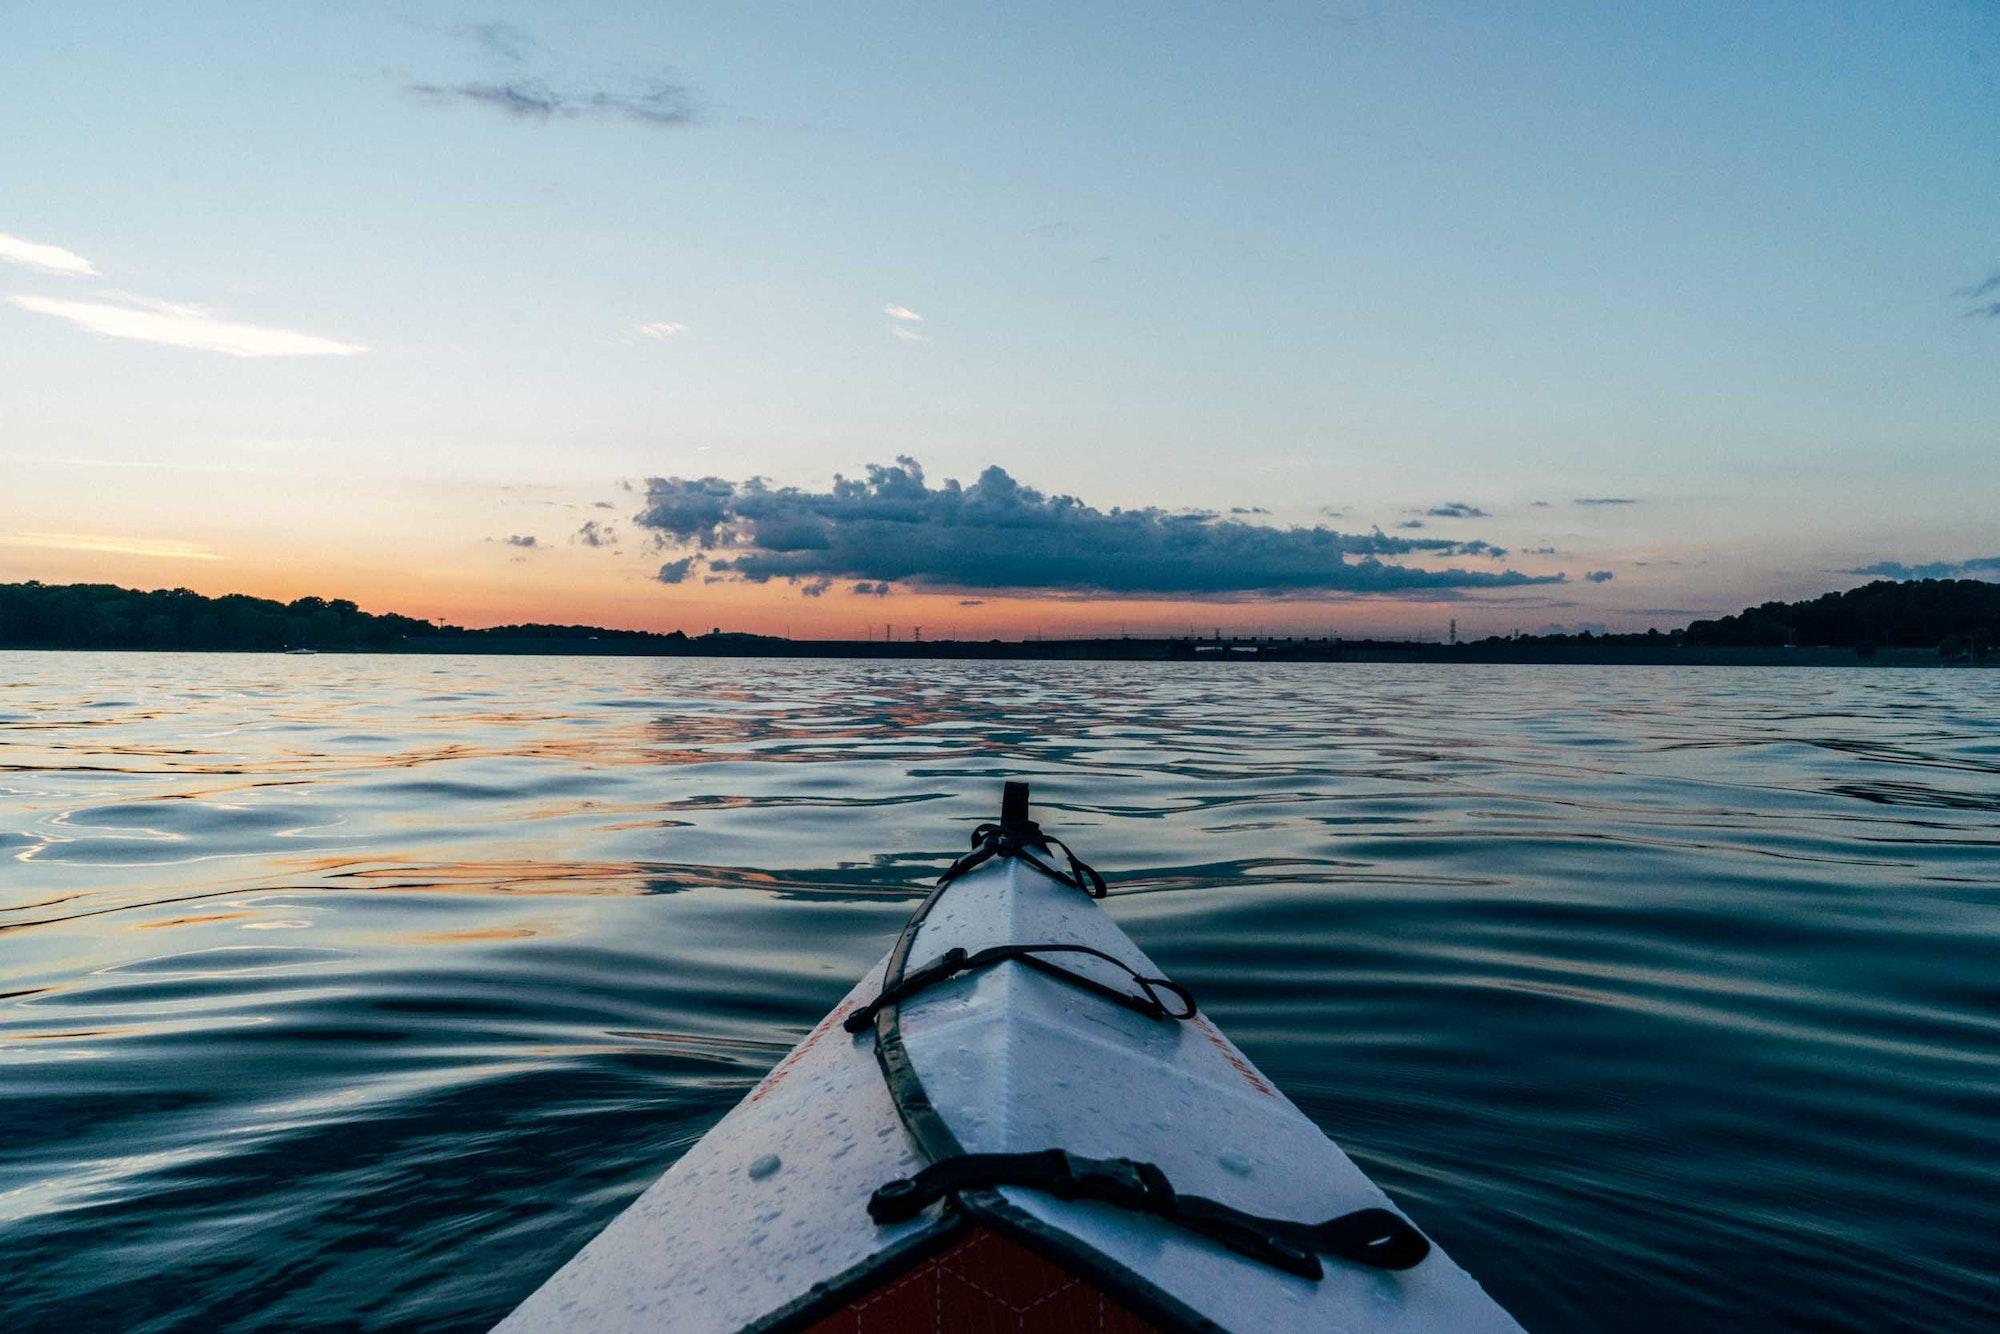 May contain: transportation, boat, vehicle, rowboat, canoe, and kayak